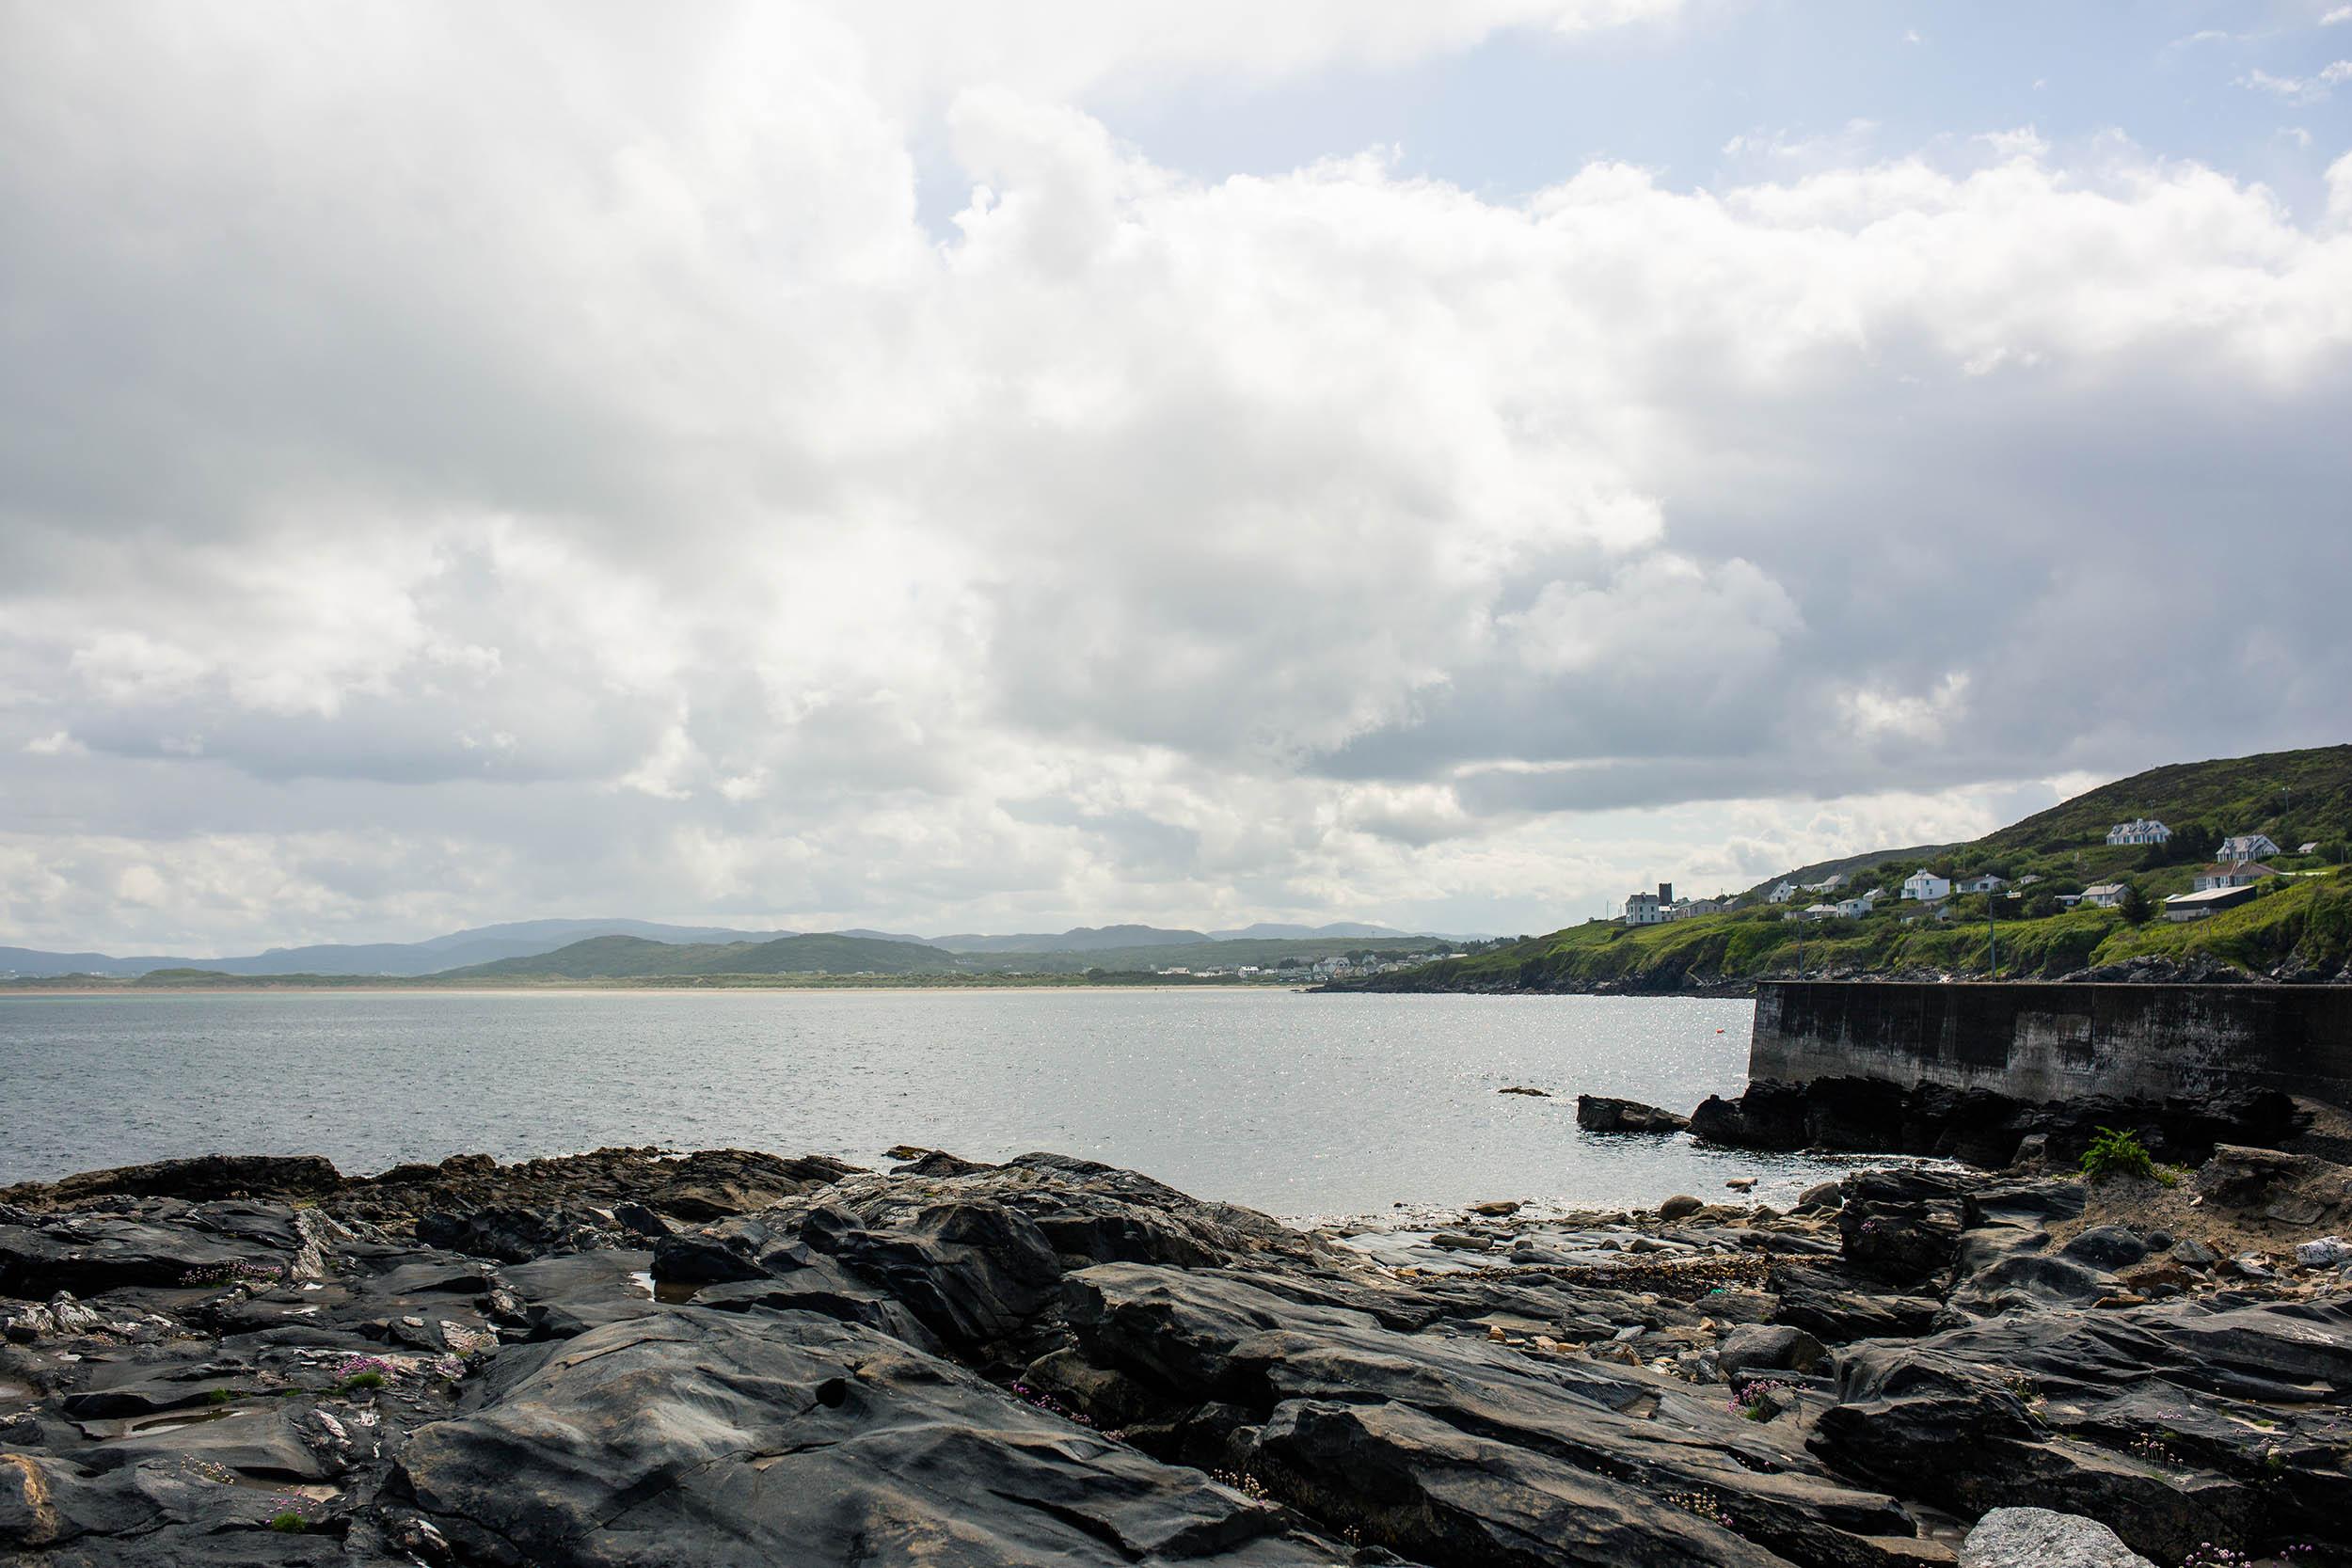 IRELAND_DONEGAL_PORTNOO_0085